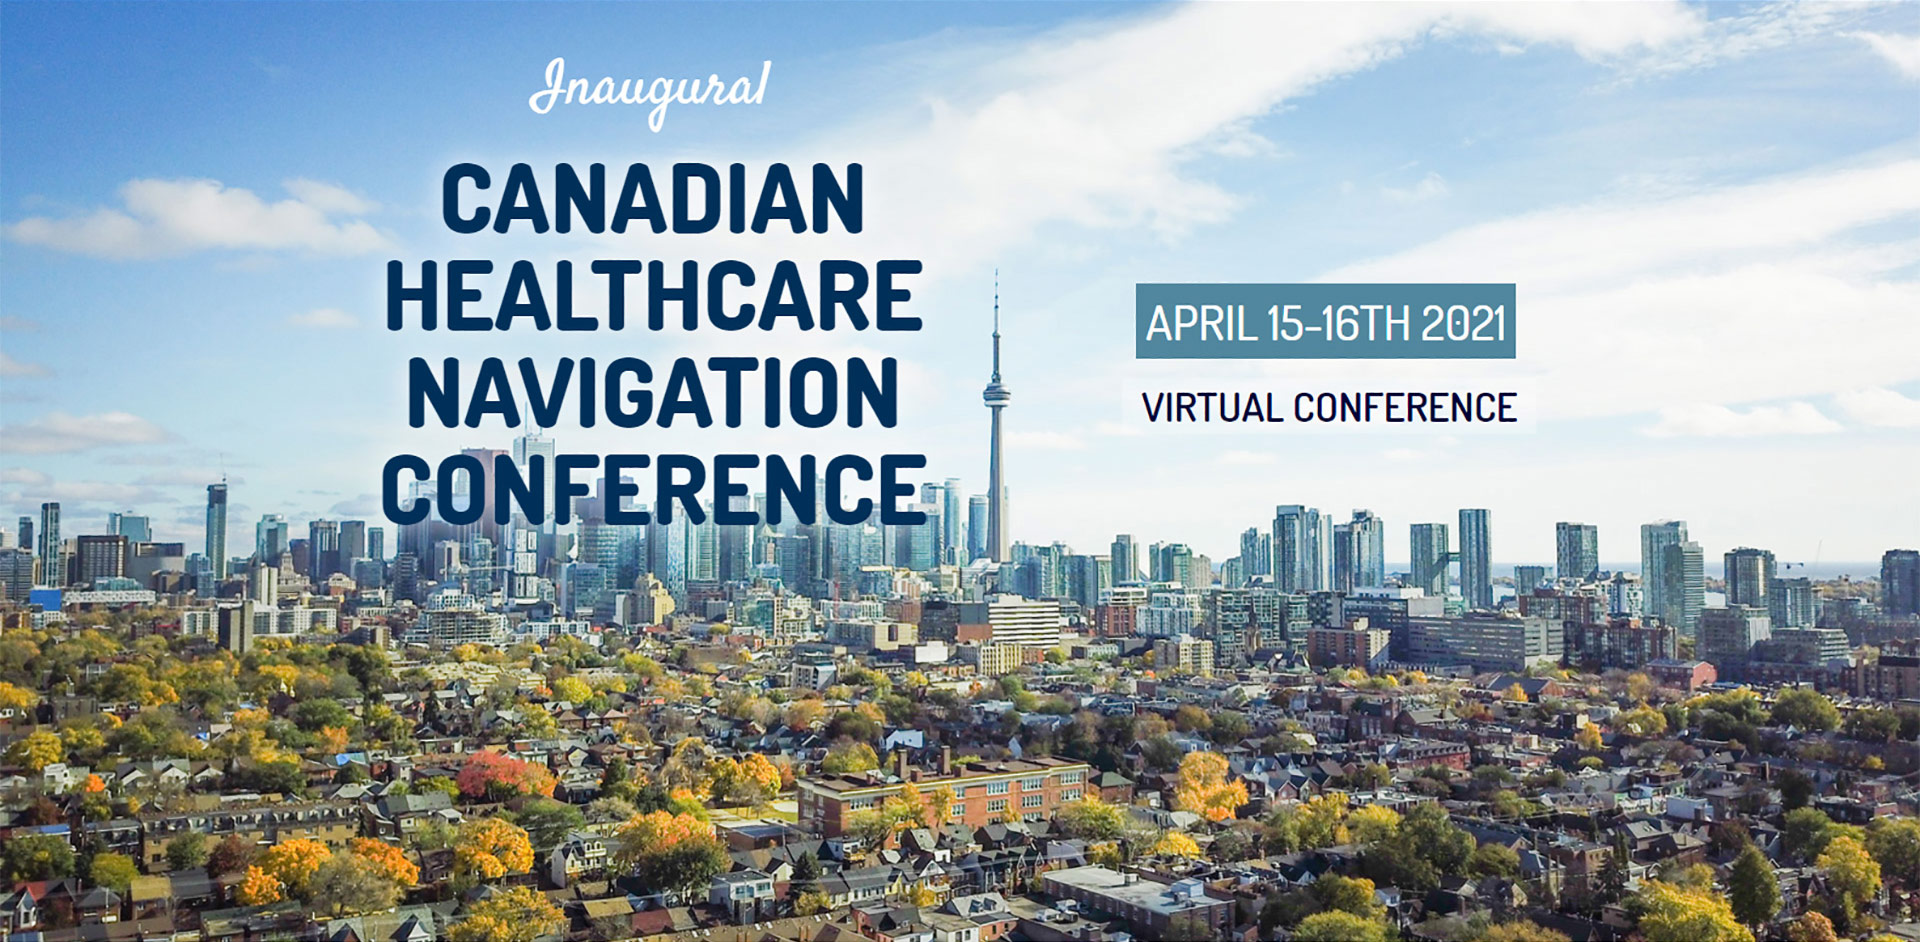 Canadian Healthcare Navigation Conference, April 15-16, 2021, Virtual Conference